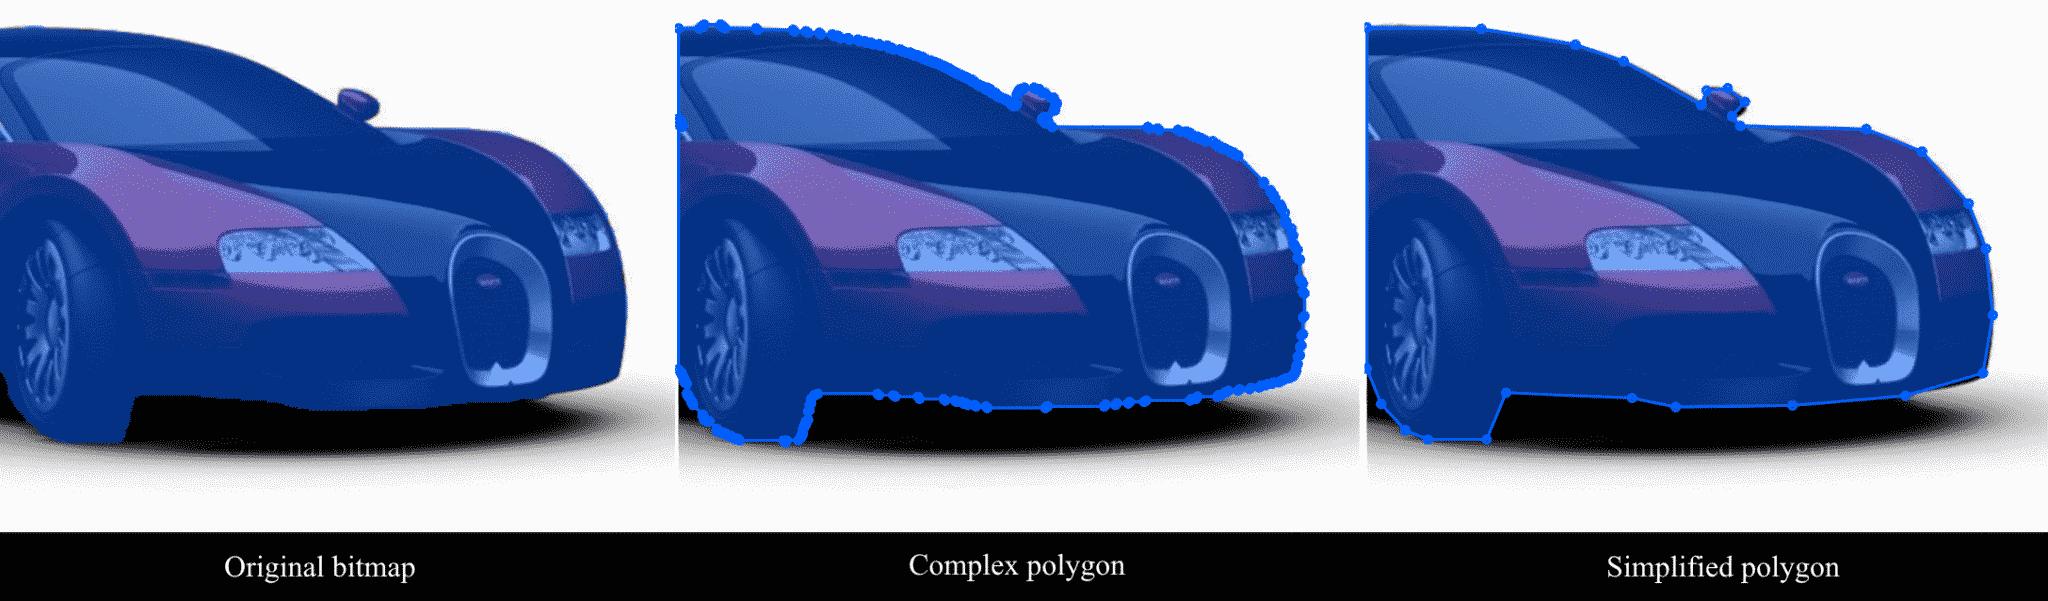 Original bitmap, auto complex polygon, automatic simplified polygon